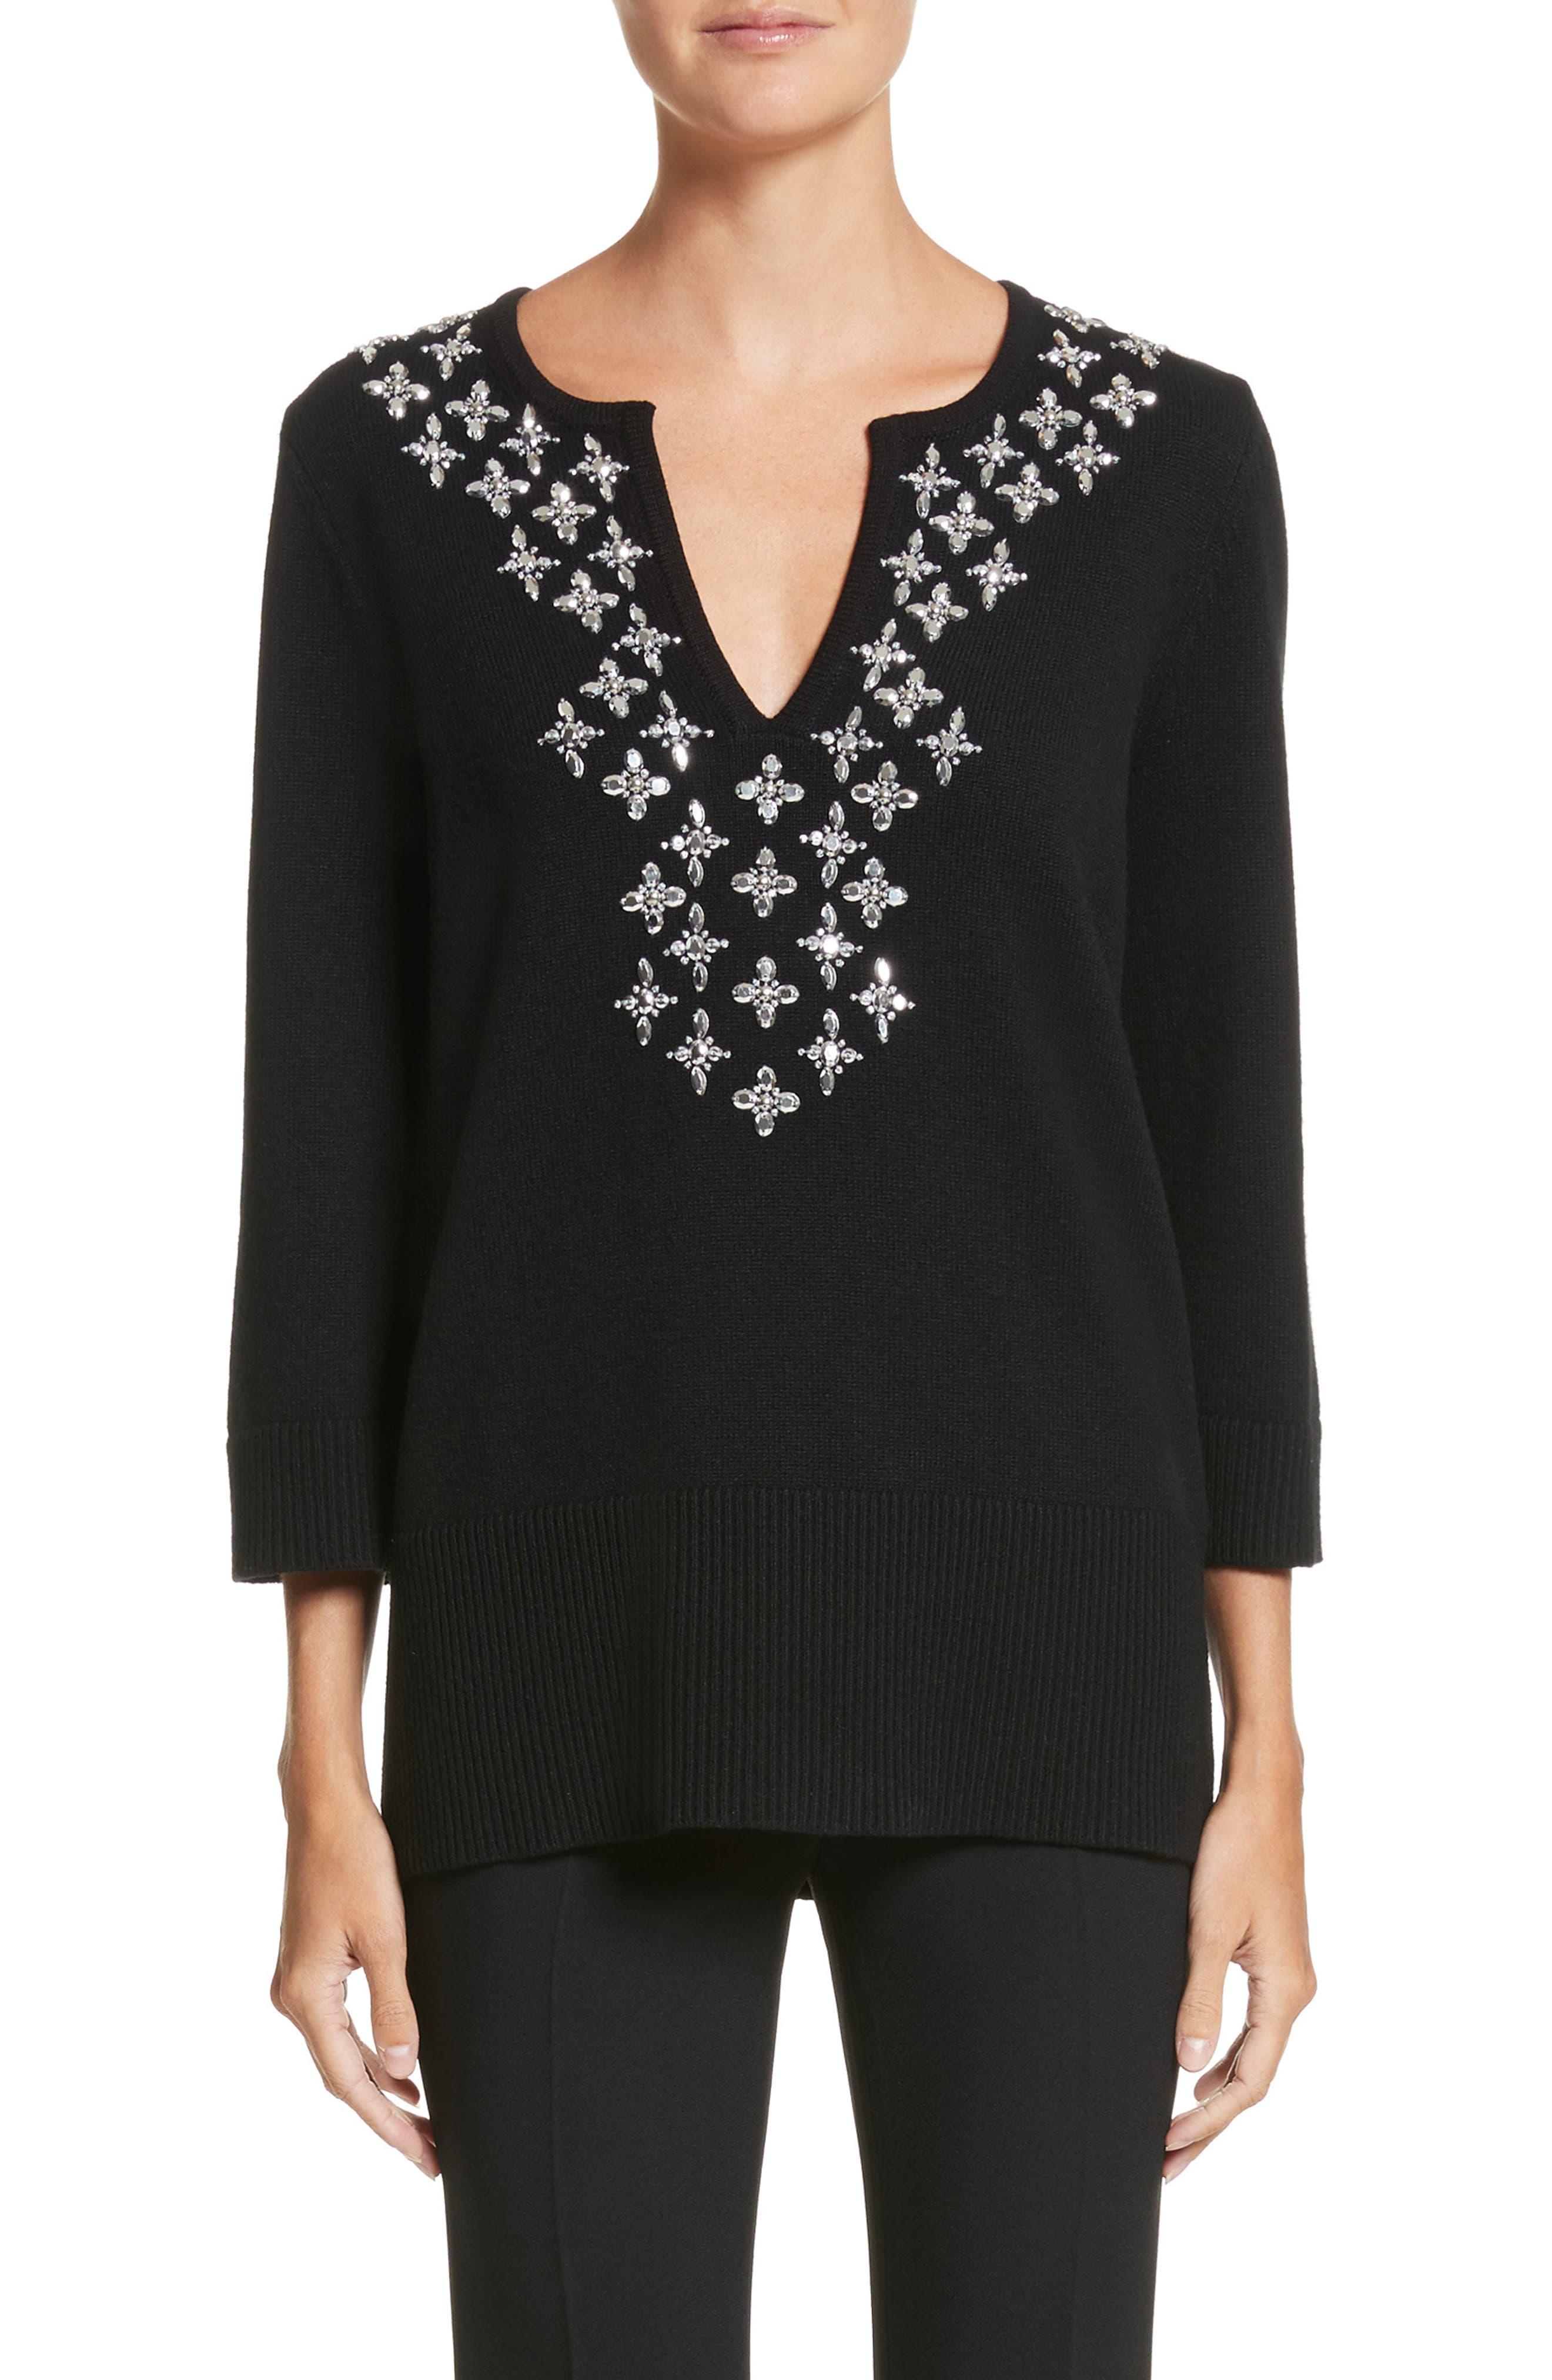 Michael Kors Embellished Cashmere Tunic